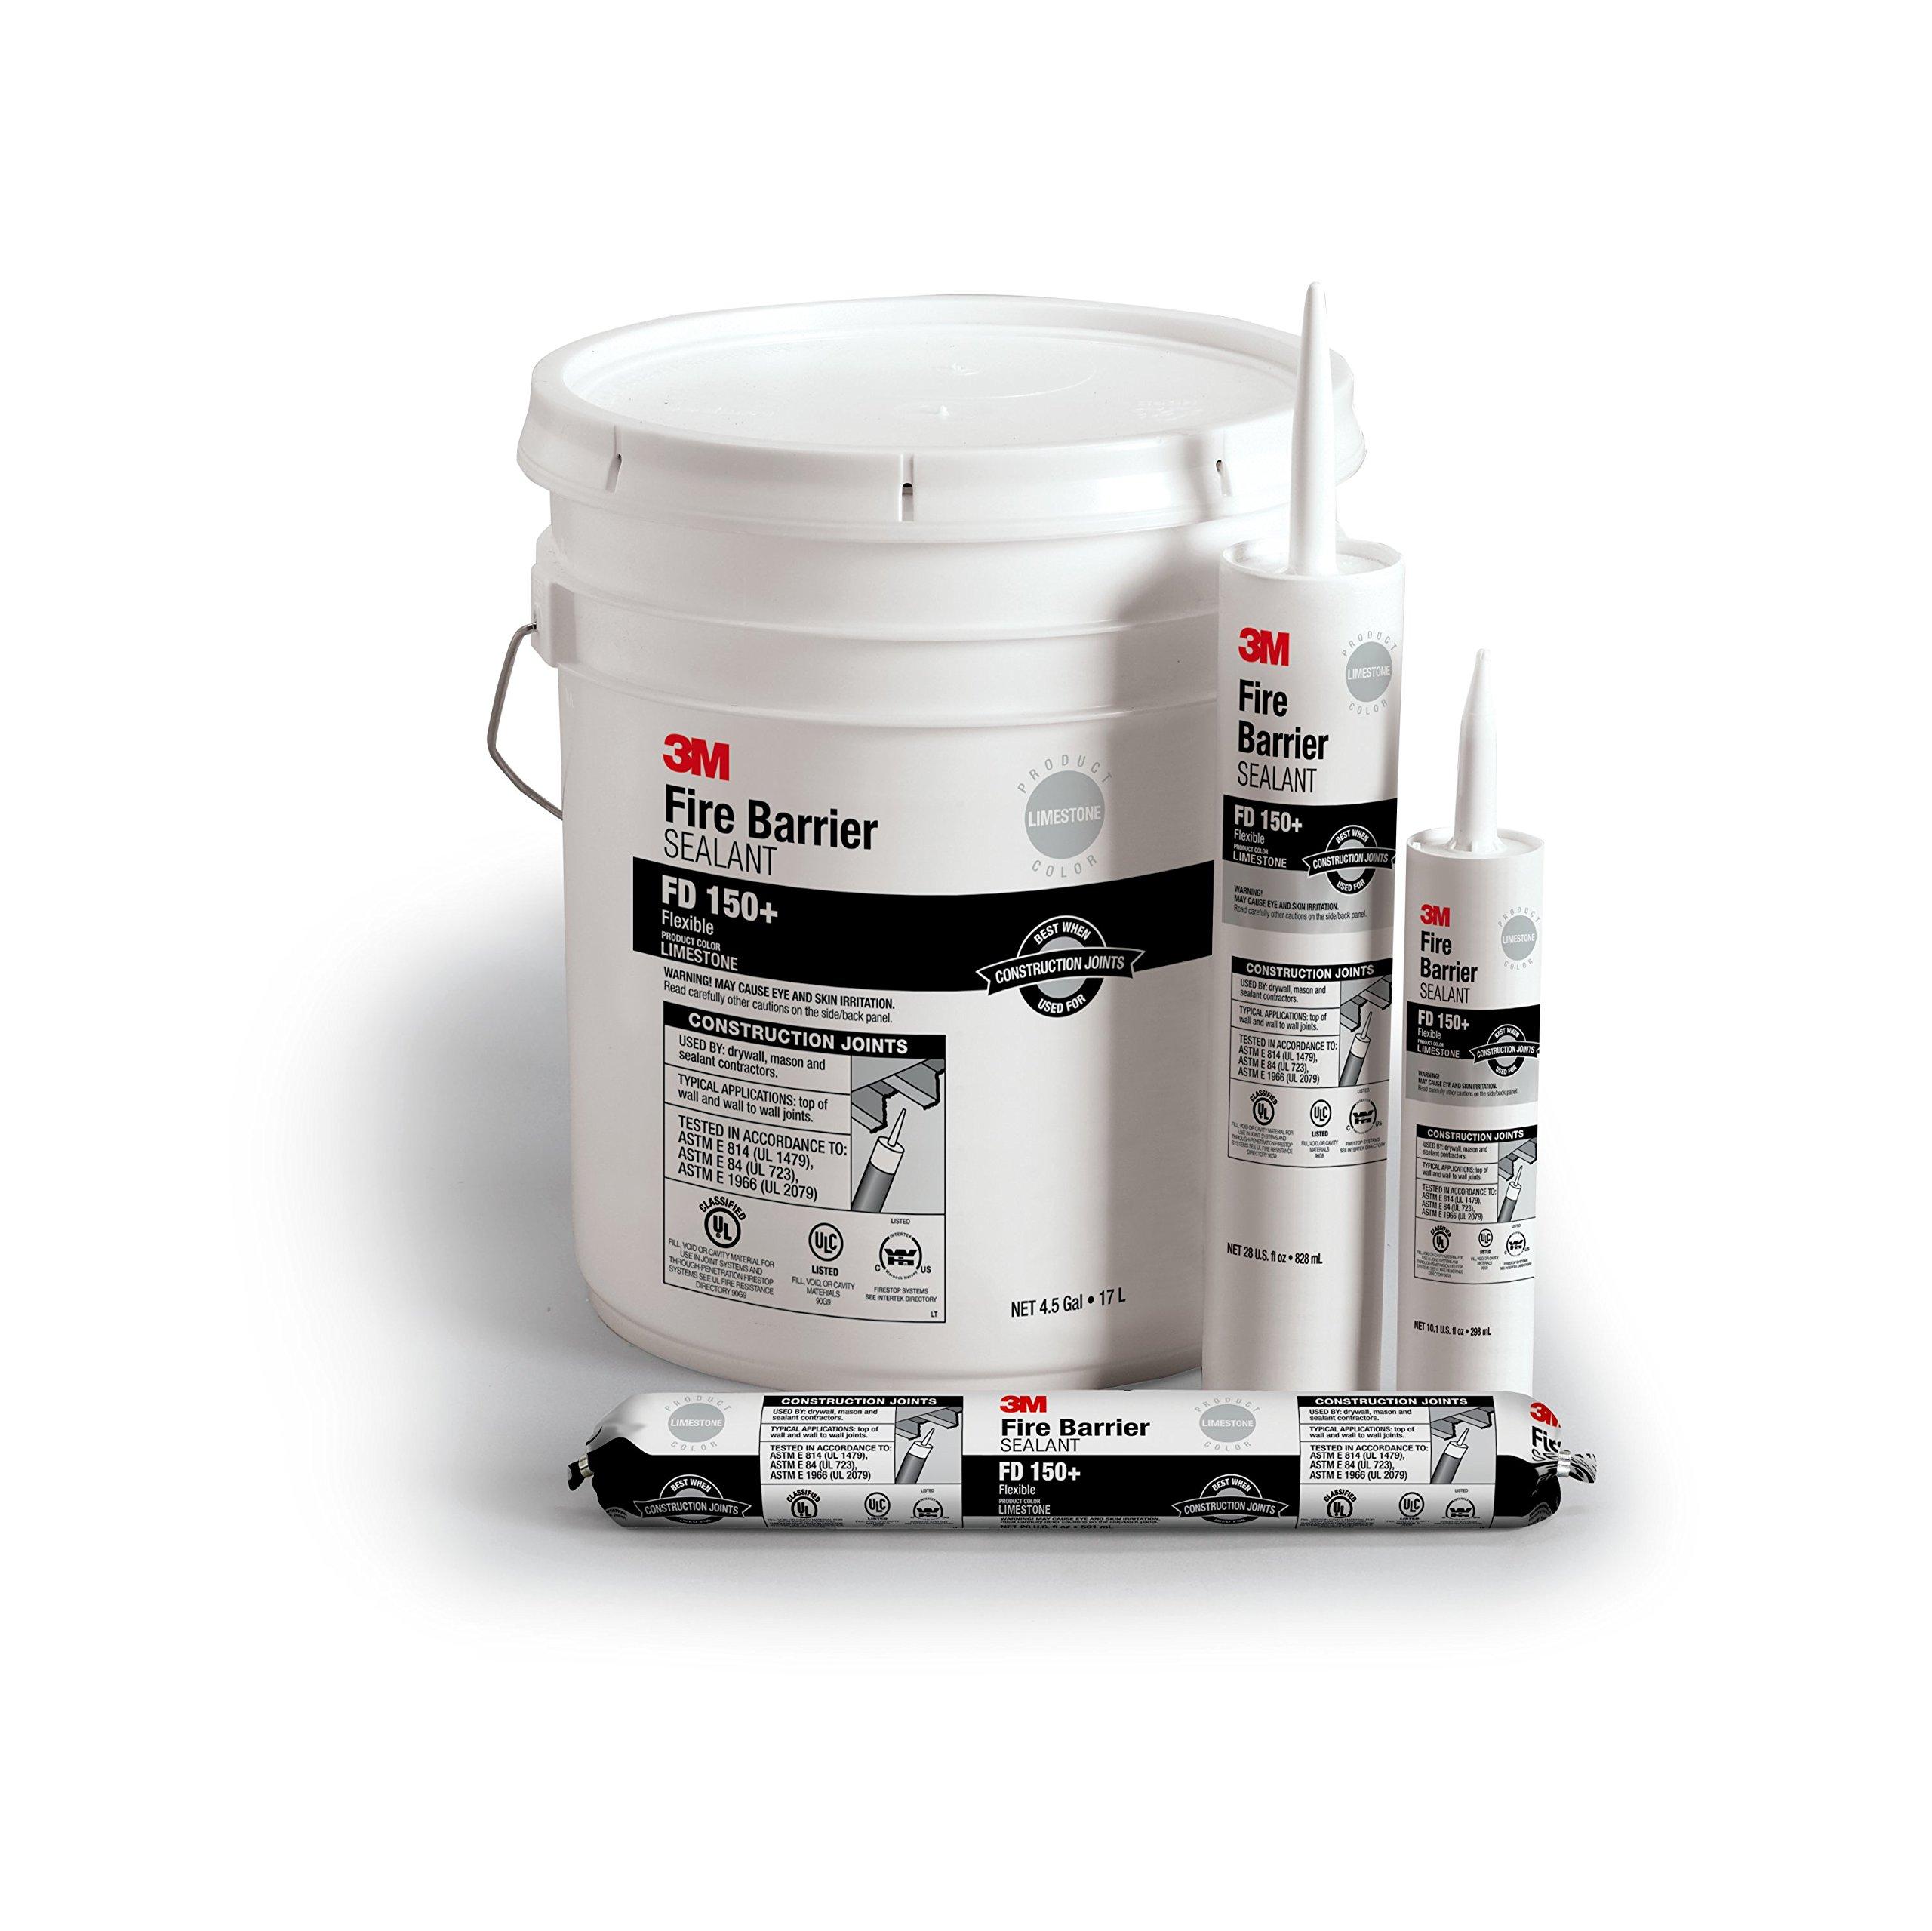 3M 16565-case Fire Barrier Sealant FD 150+ Limestone, Pail, 1/case, 4.5 gal